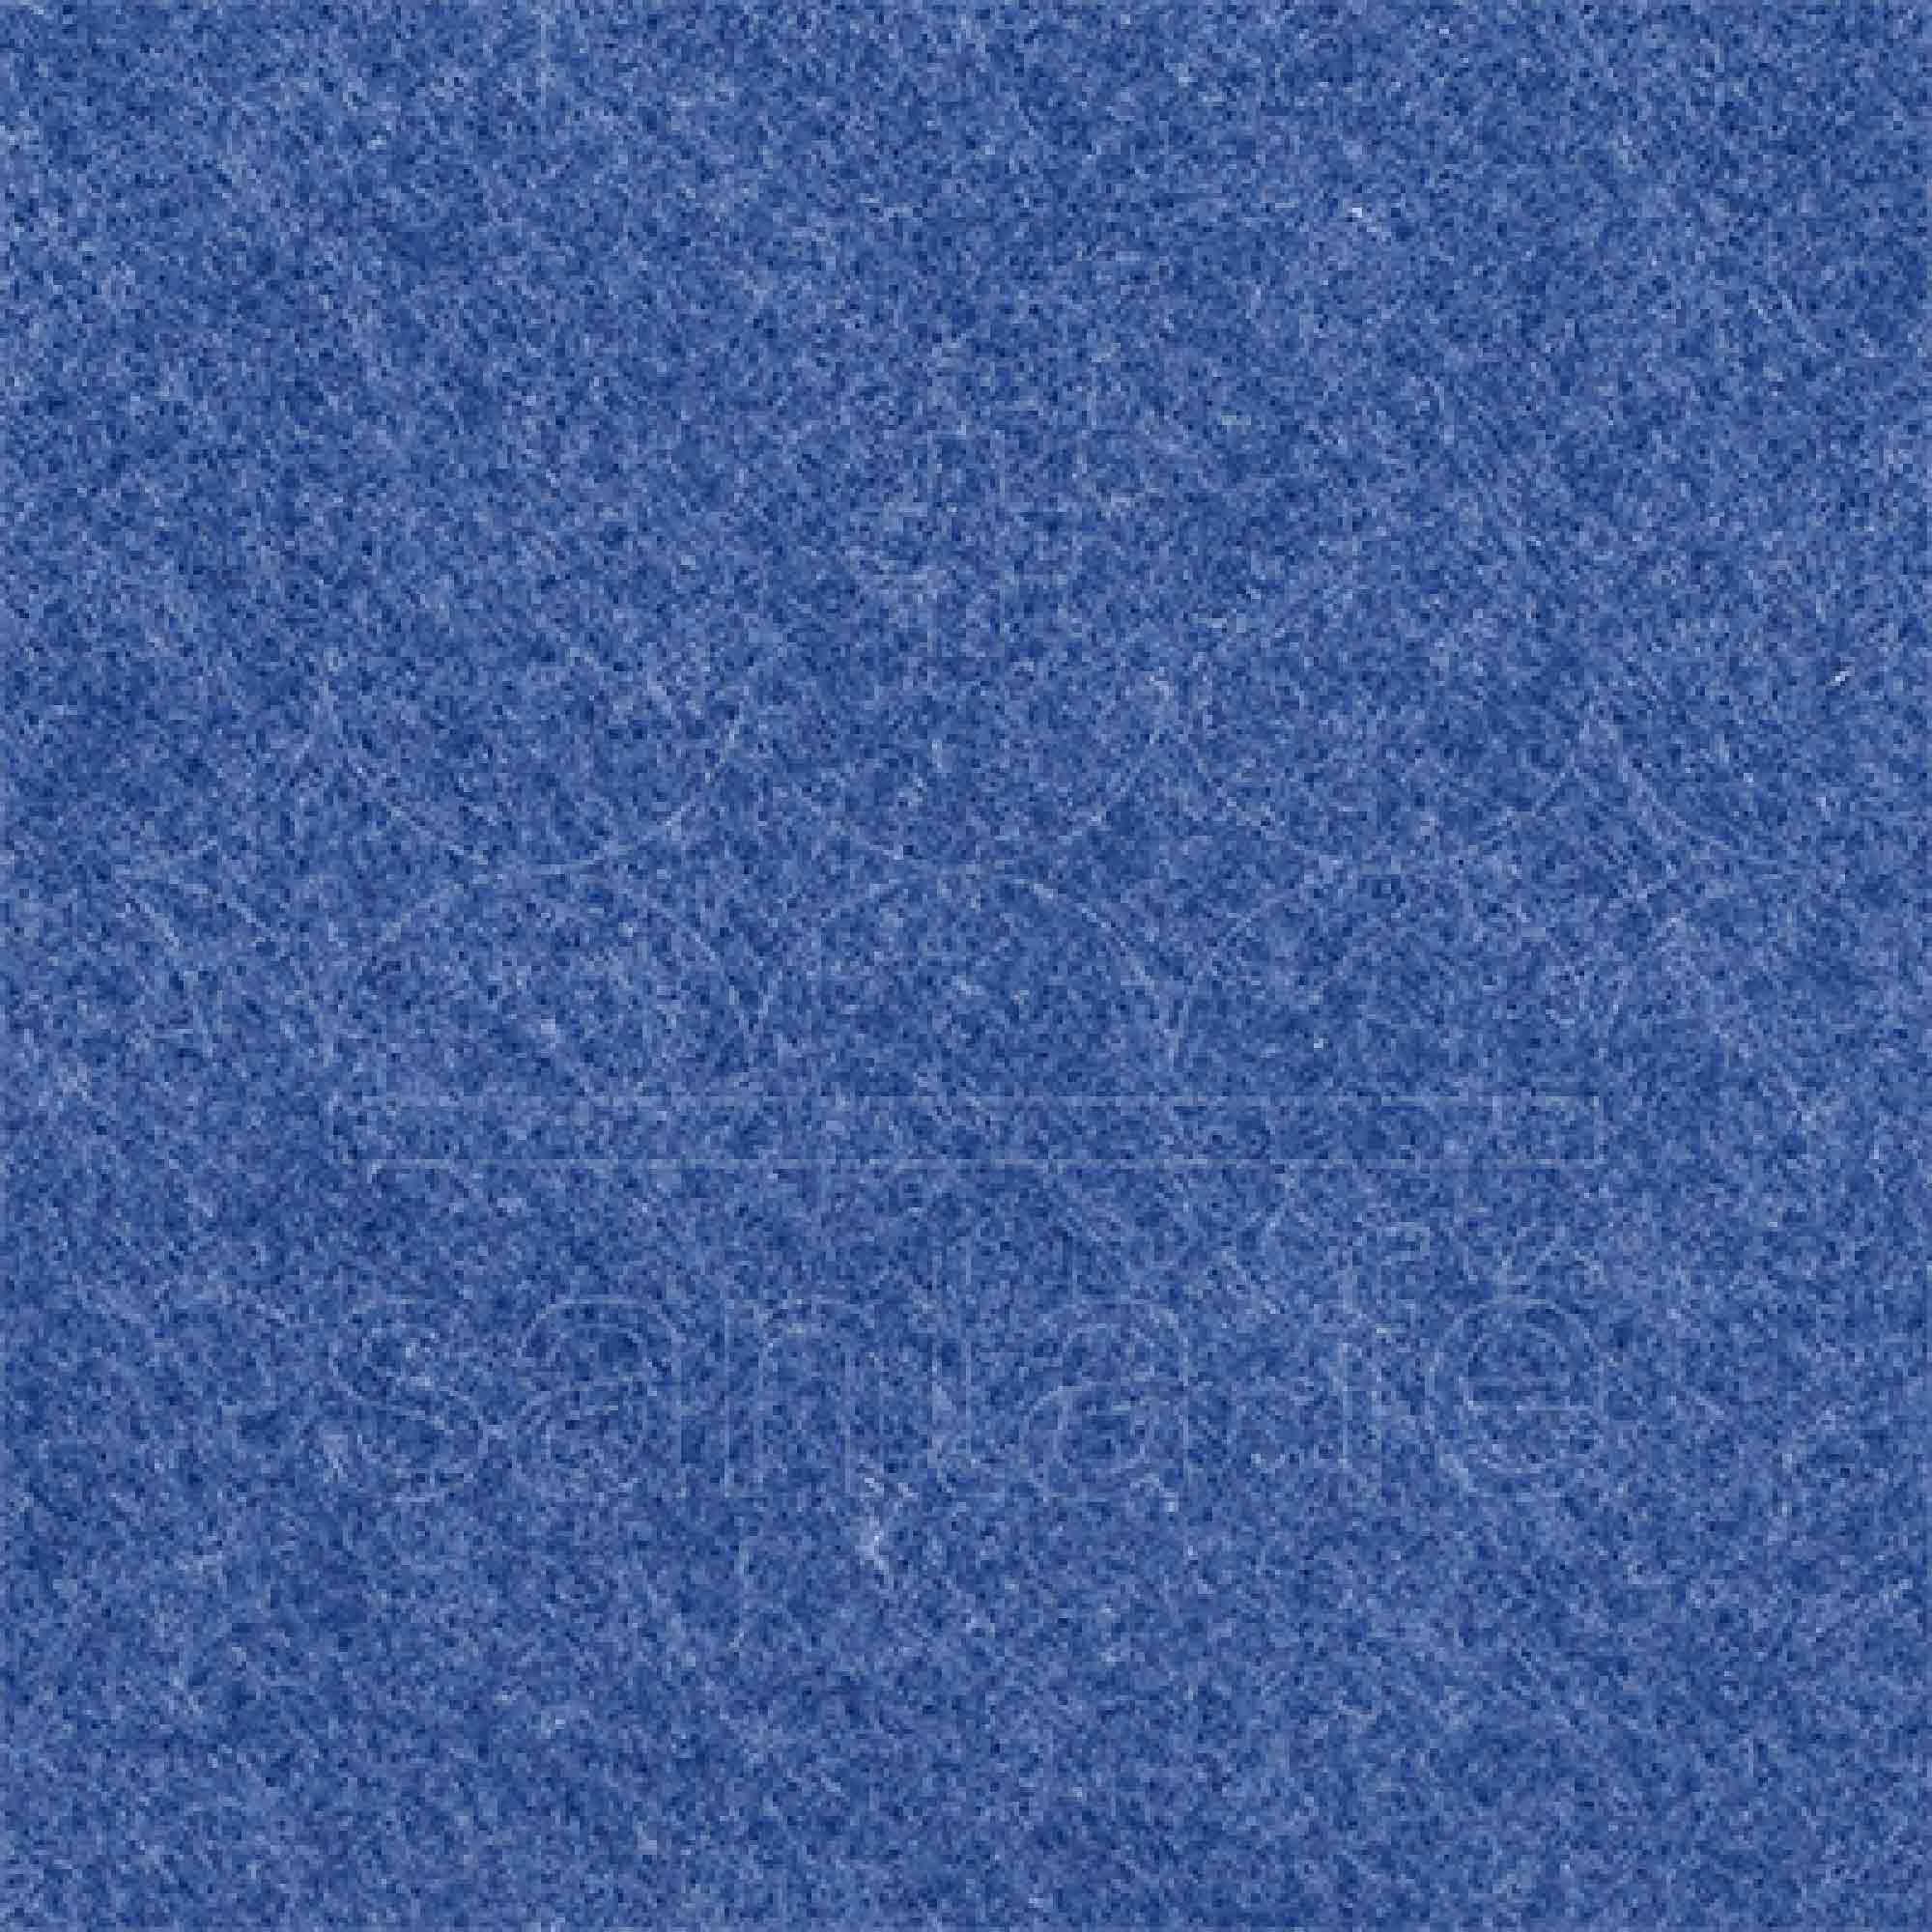 Tecido Feltro Mescla 100% Poliester 1,40 Mt Largura Azul/Jeans